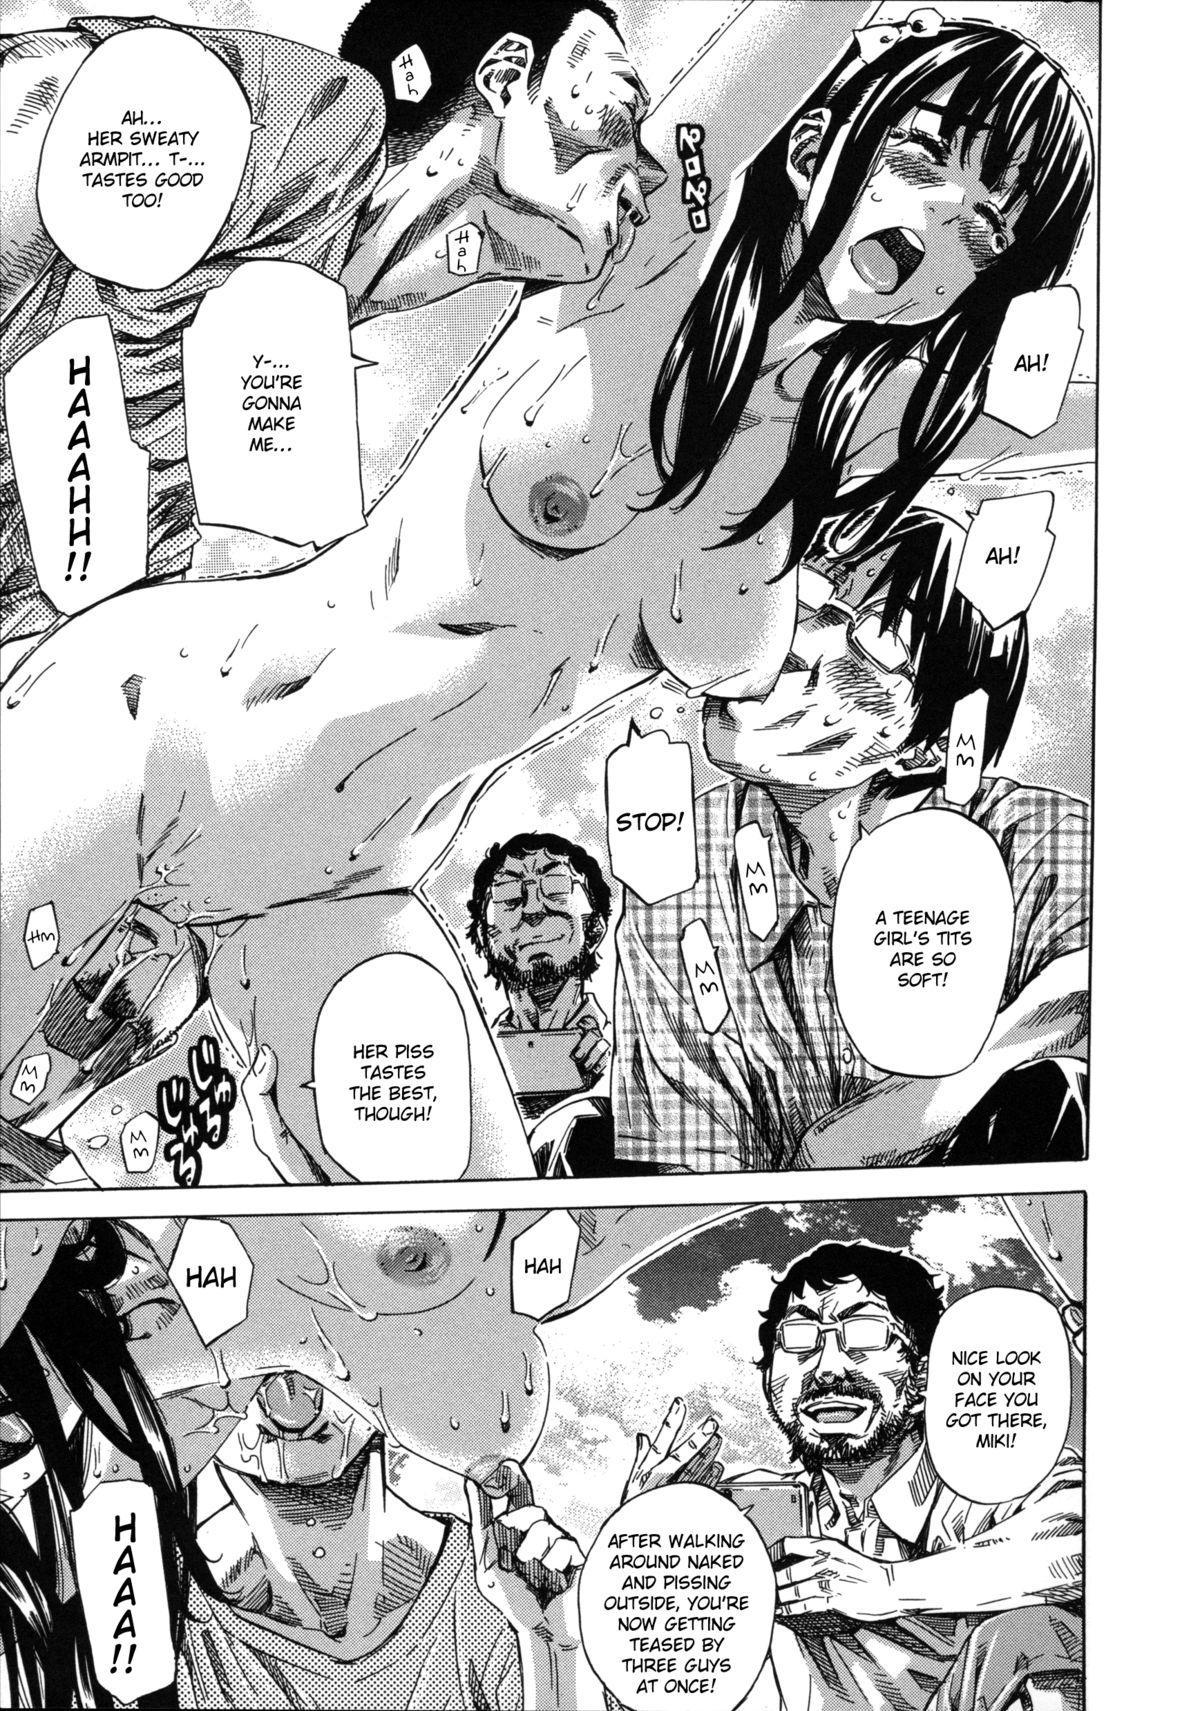 Kashiwazaki Miki wa Ironna Basho de Zenra Sanpo Shitemita | Miki Kashiwazaki Goes Naked in All Sorts of Places 181